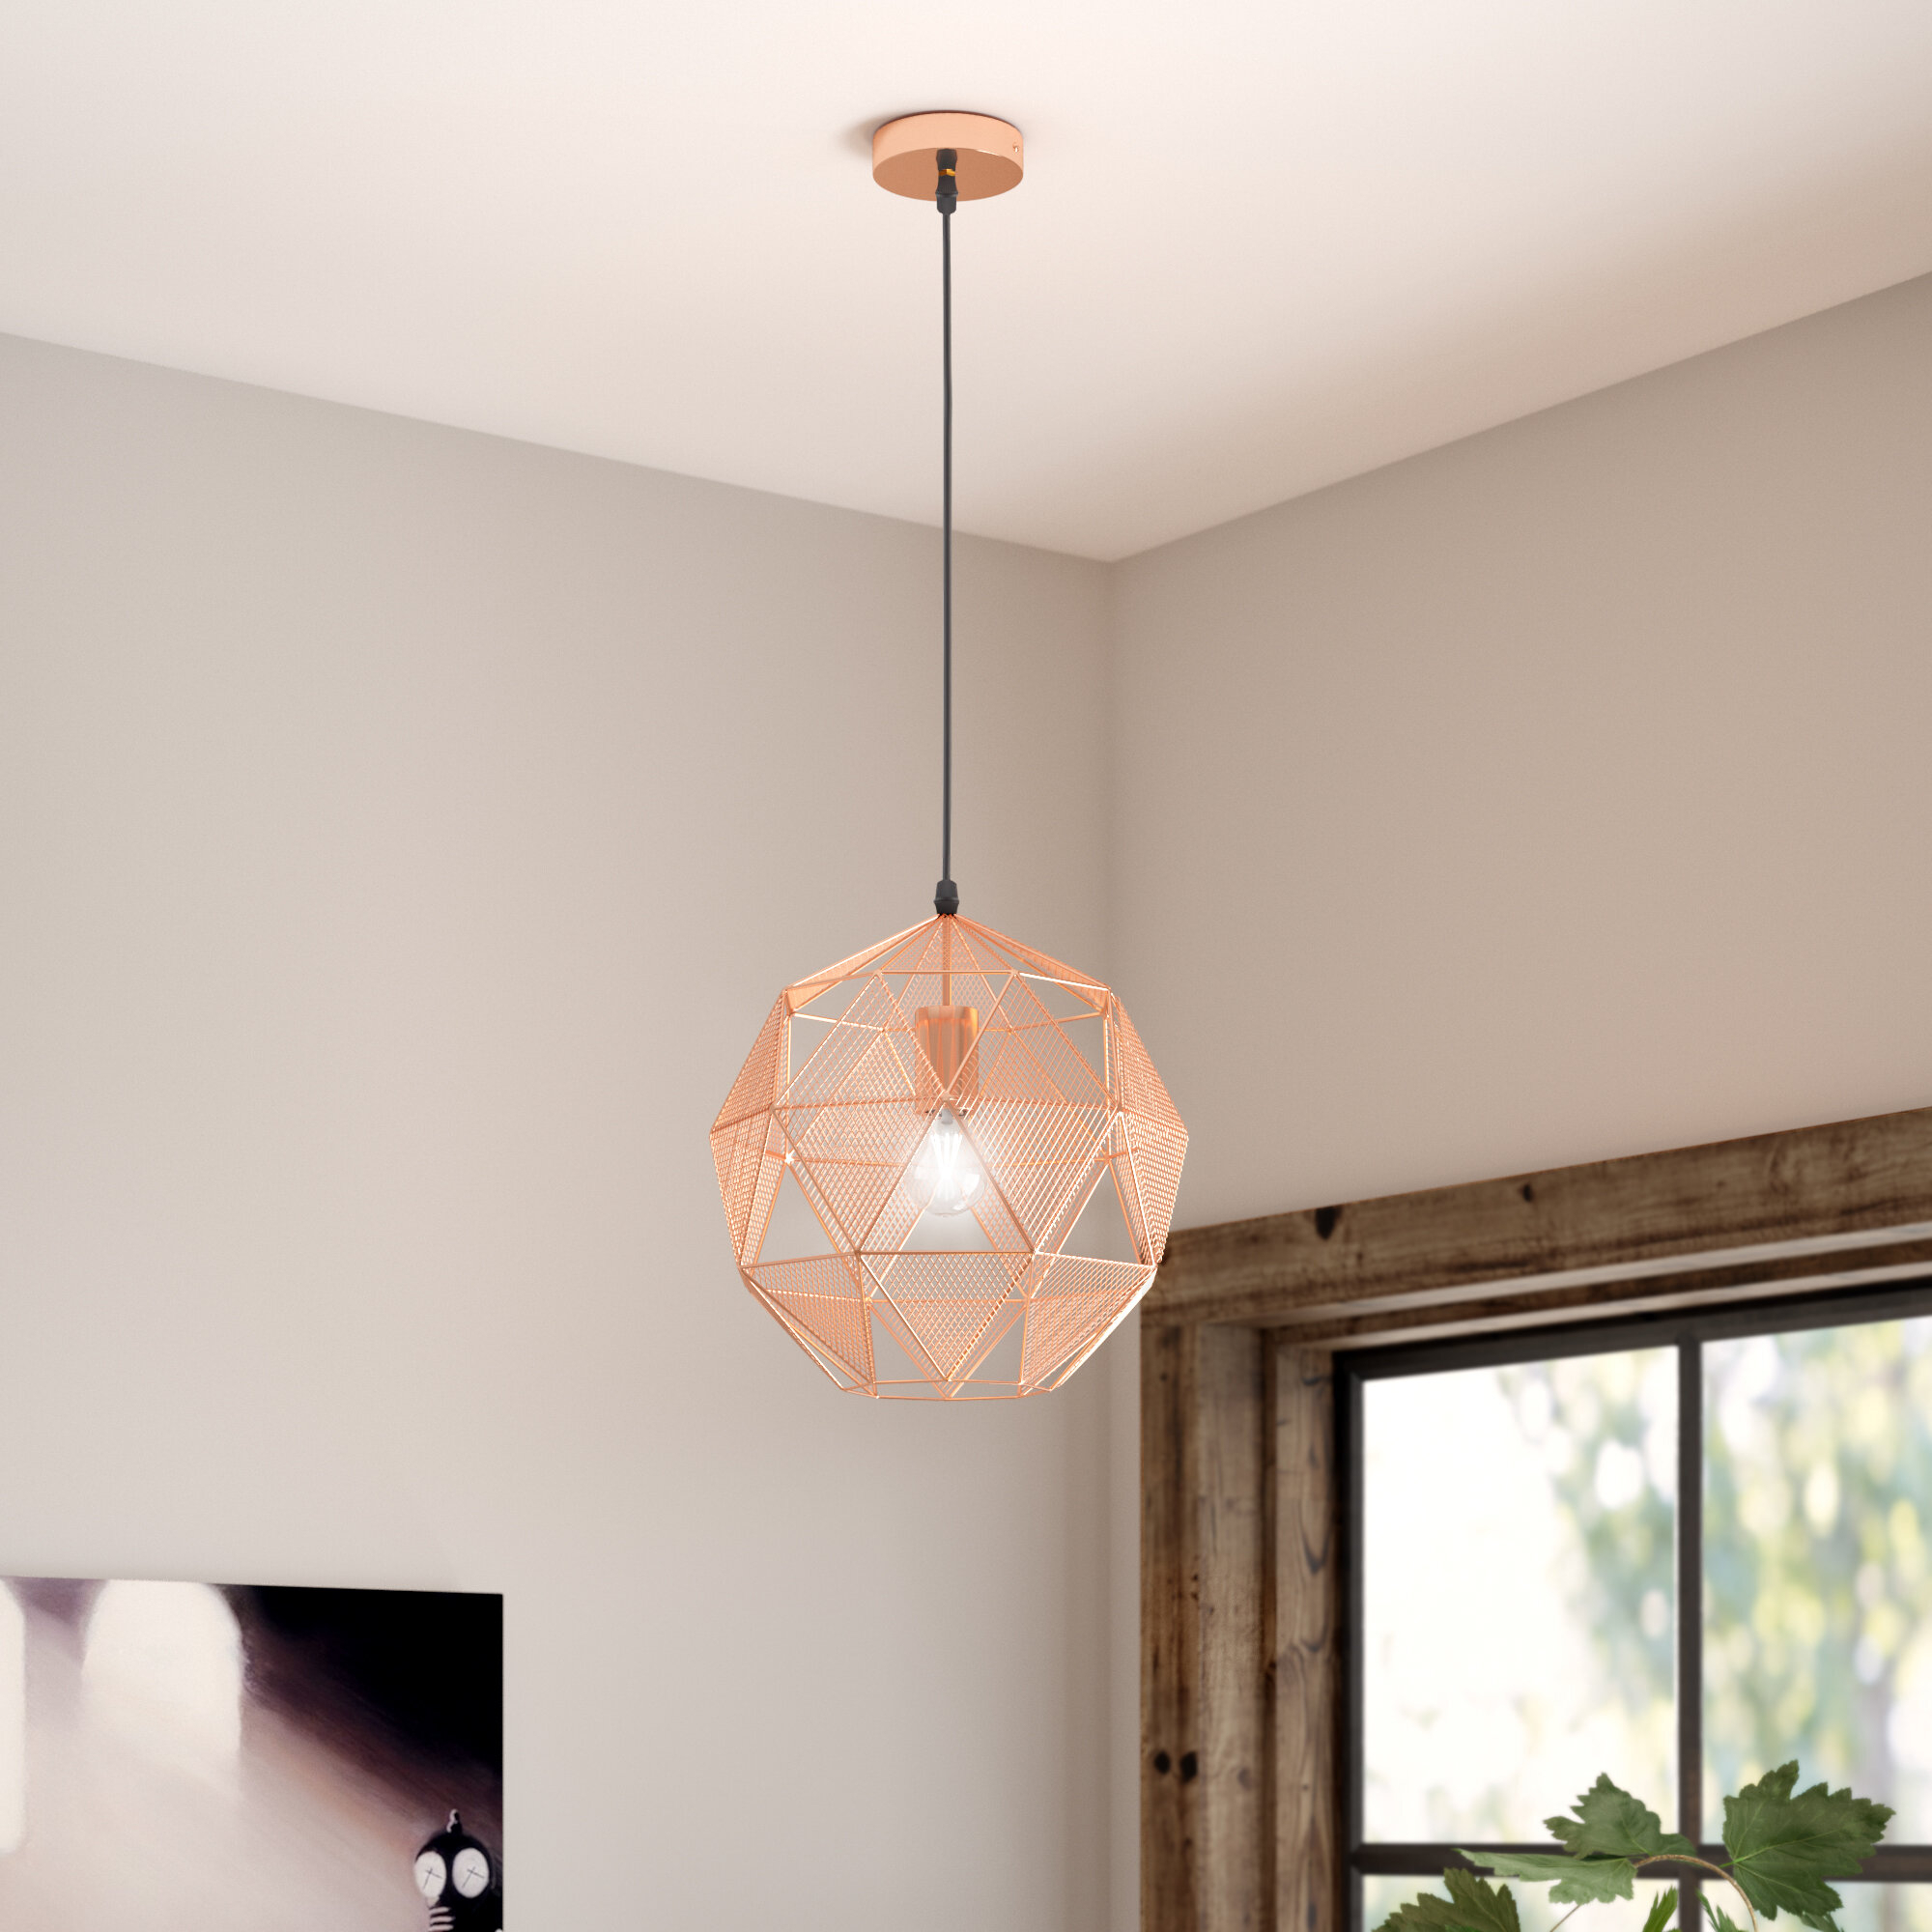 Immanuel 1-Light Geometric Pendant with regard to 1-Light Geometric Globe Pendants (Image 19 of 30)